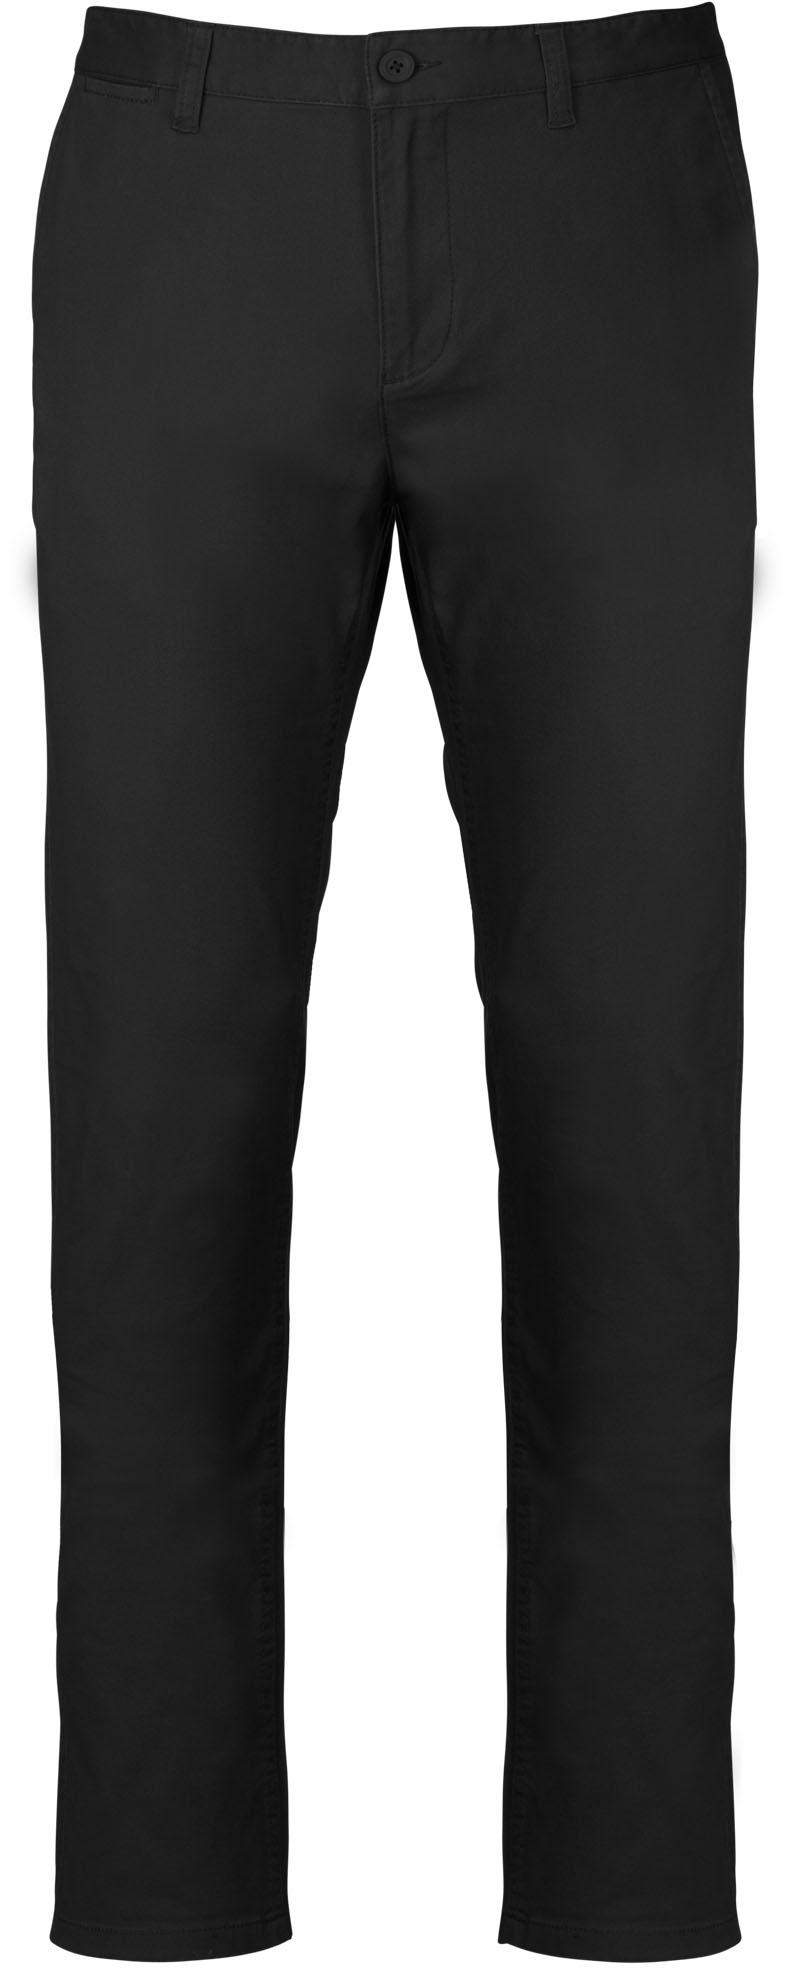 Pantalon chino homme - 2-1478-4